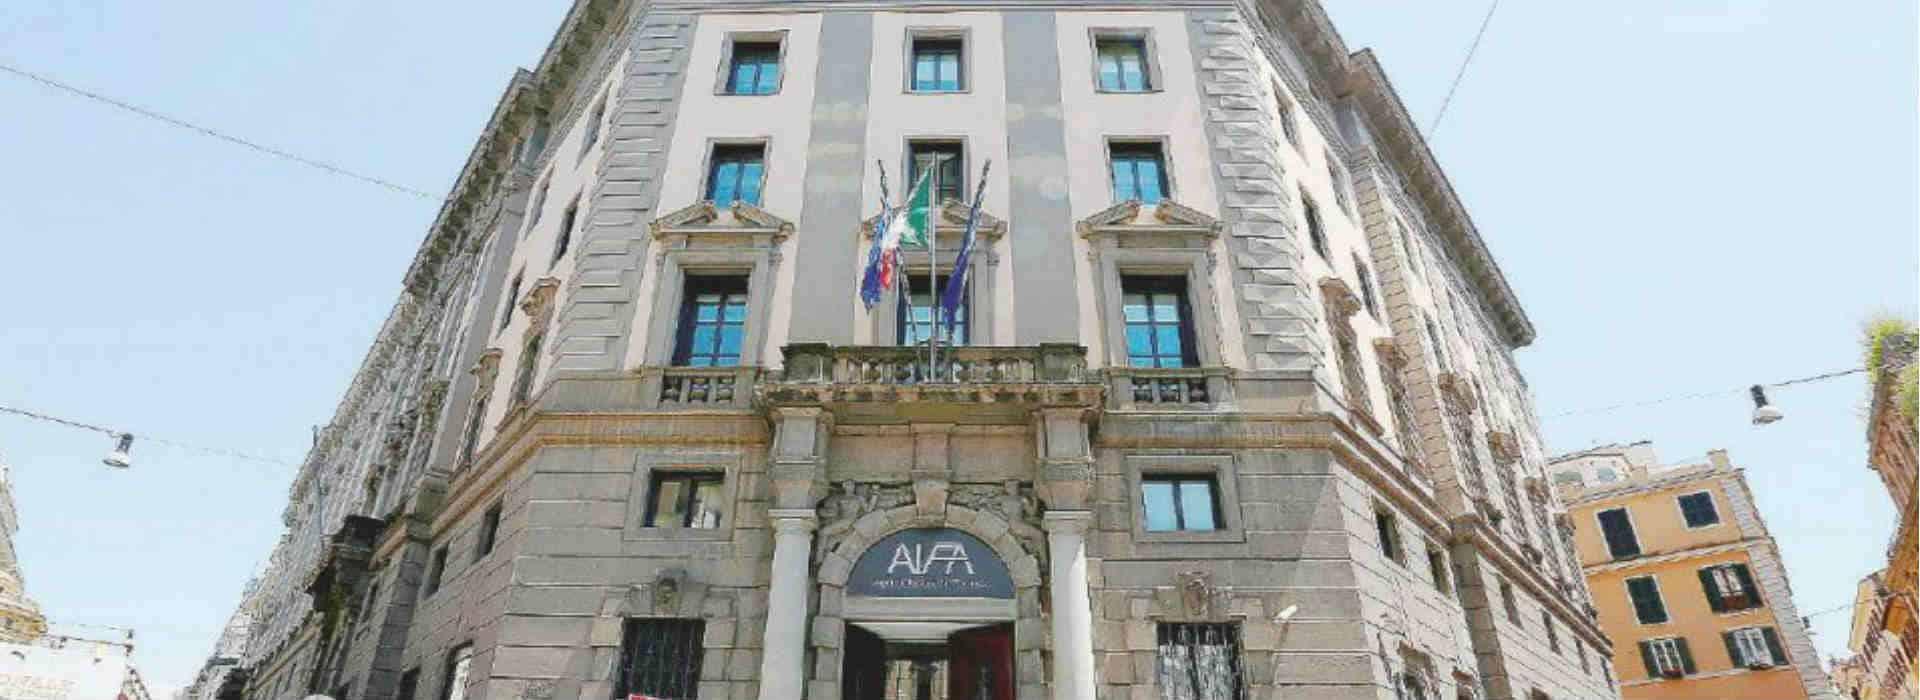 Palazzo dell'Aifa